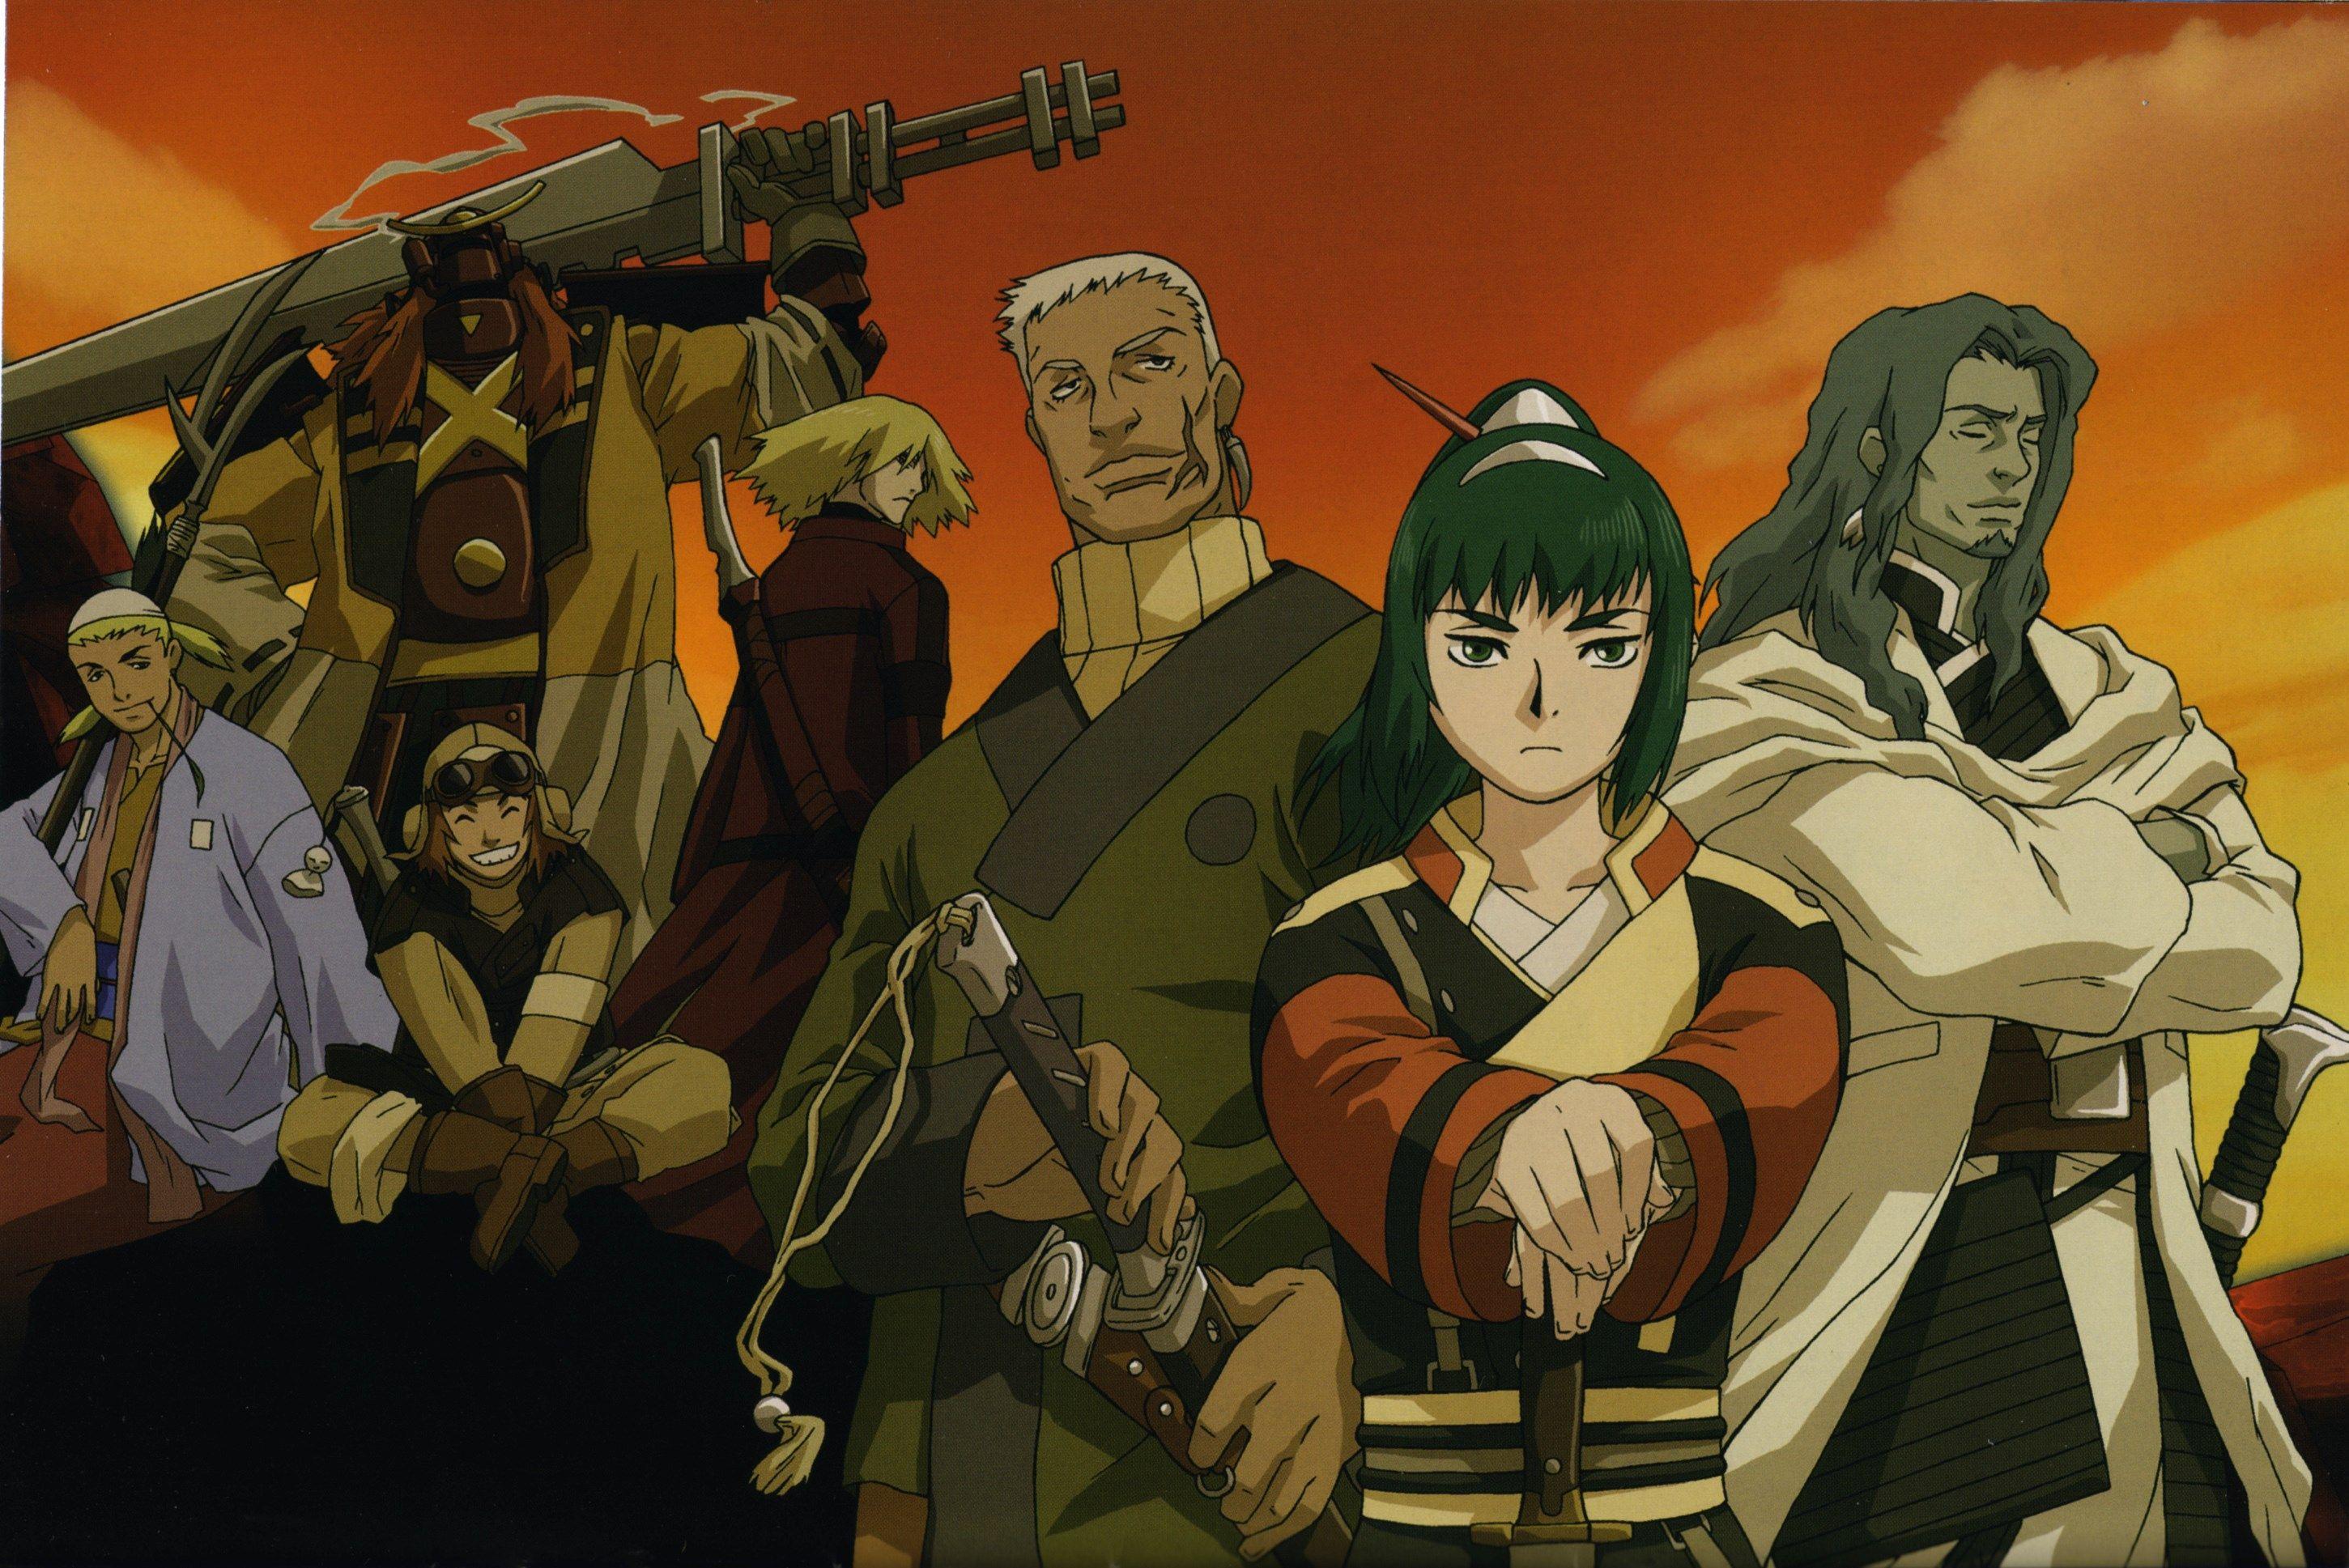 2901x1937 wallpapers free samurai 7 Seven anime, Anime